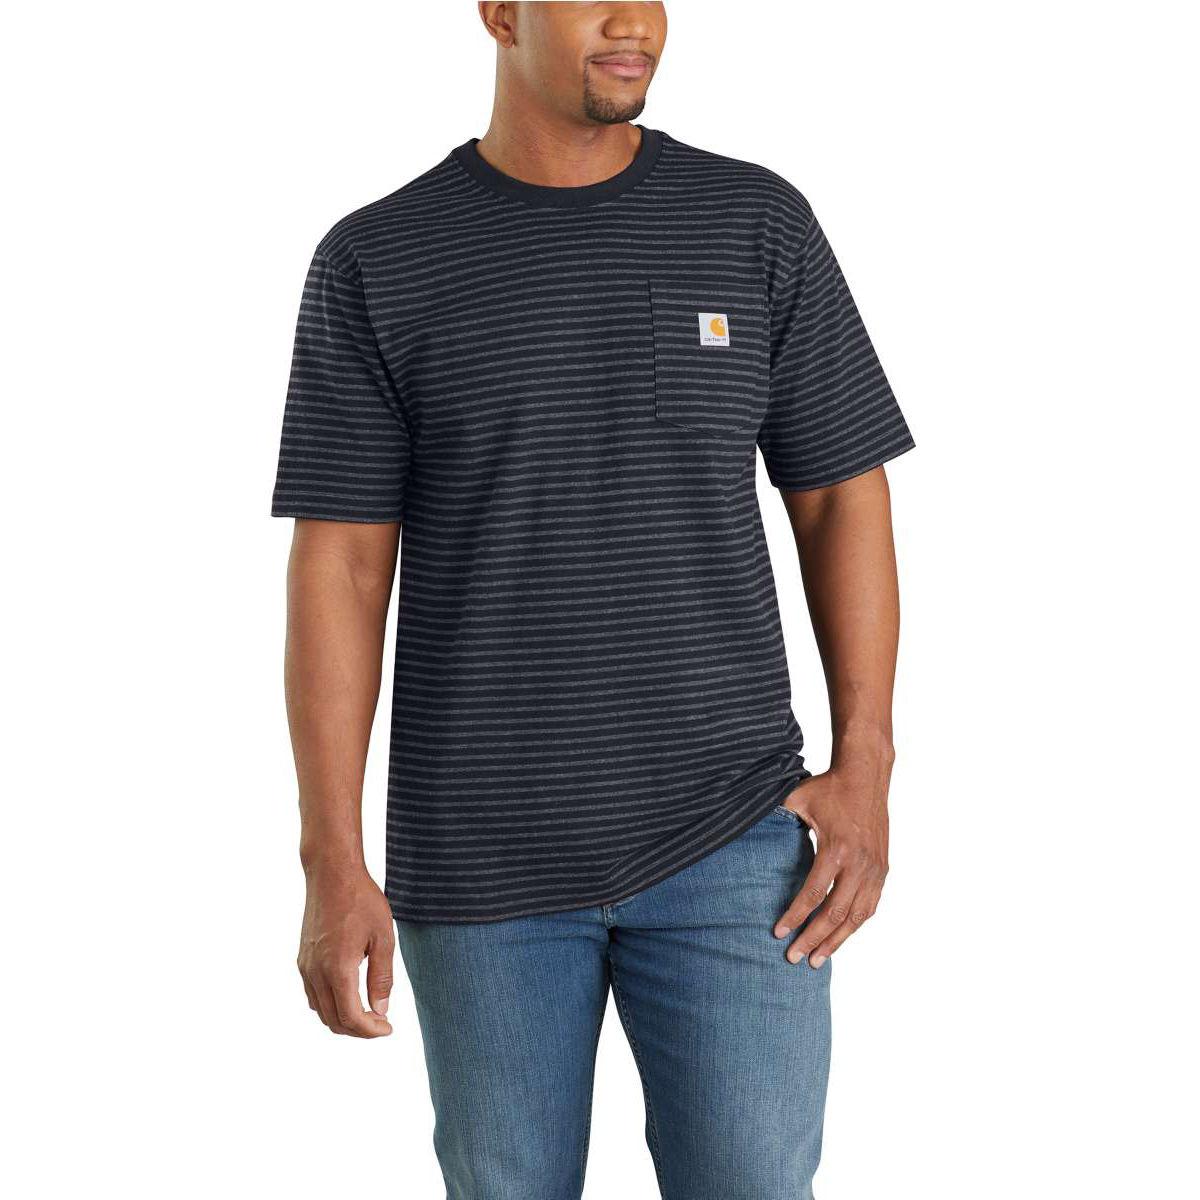 Carhartt Men's Workwear Pocket Short-Sleeve Tee - Black, XXL